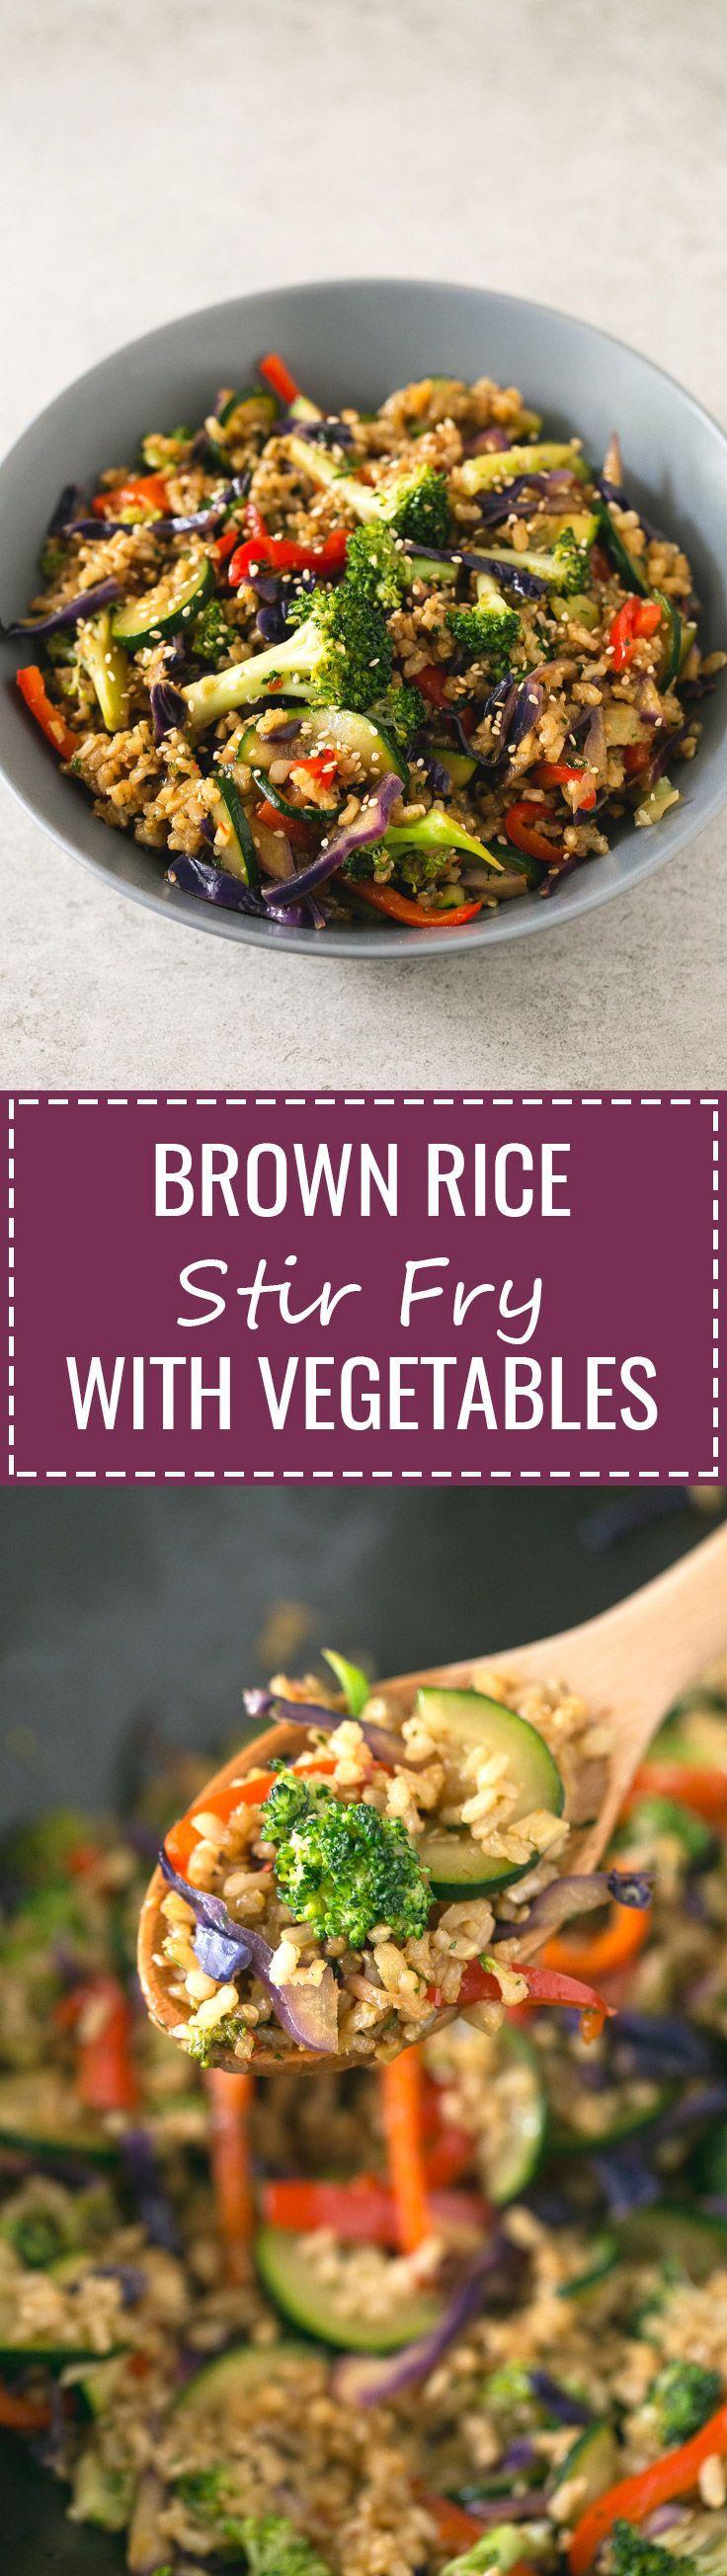 Brown Rice Stir-Fry with Vegetables  Vegan and GF